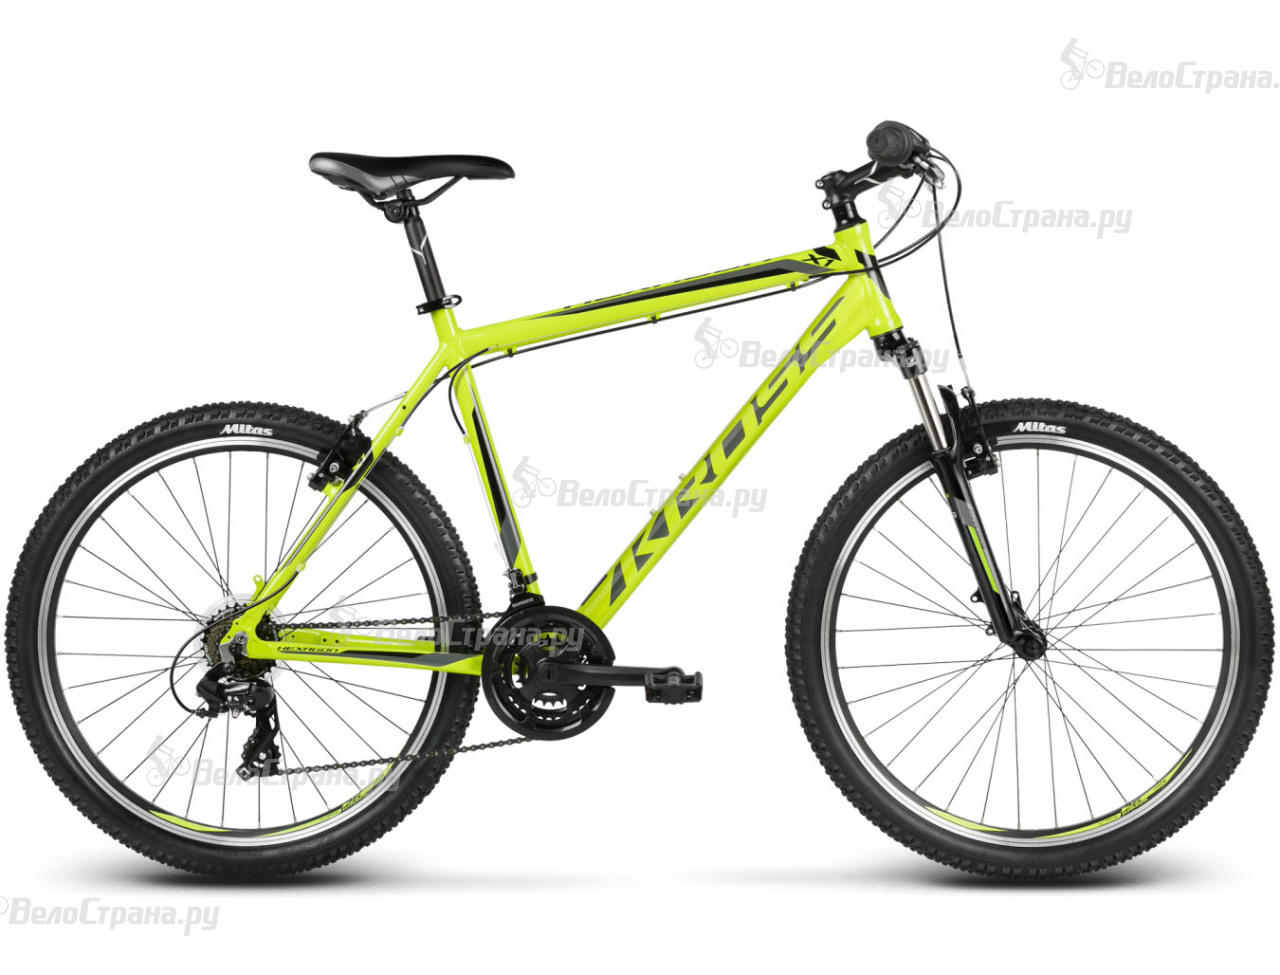 Велосипед Kross Hexagon X1 (2017) mizumi hexagon 7